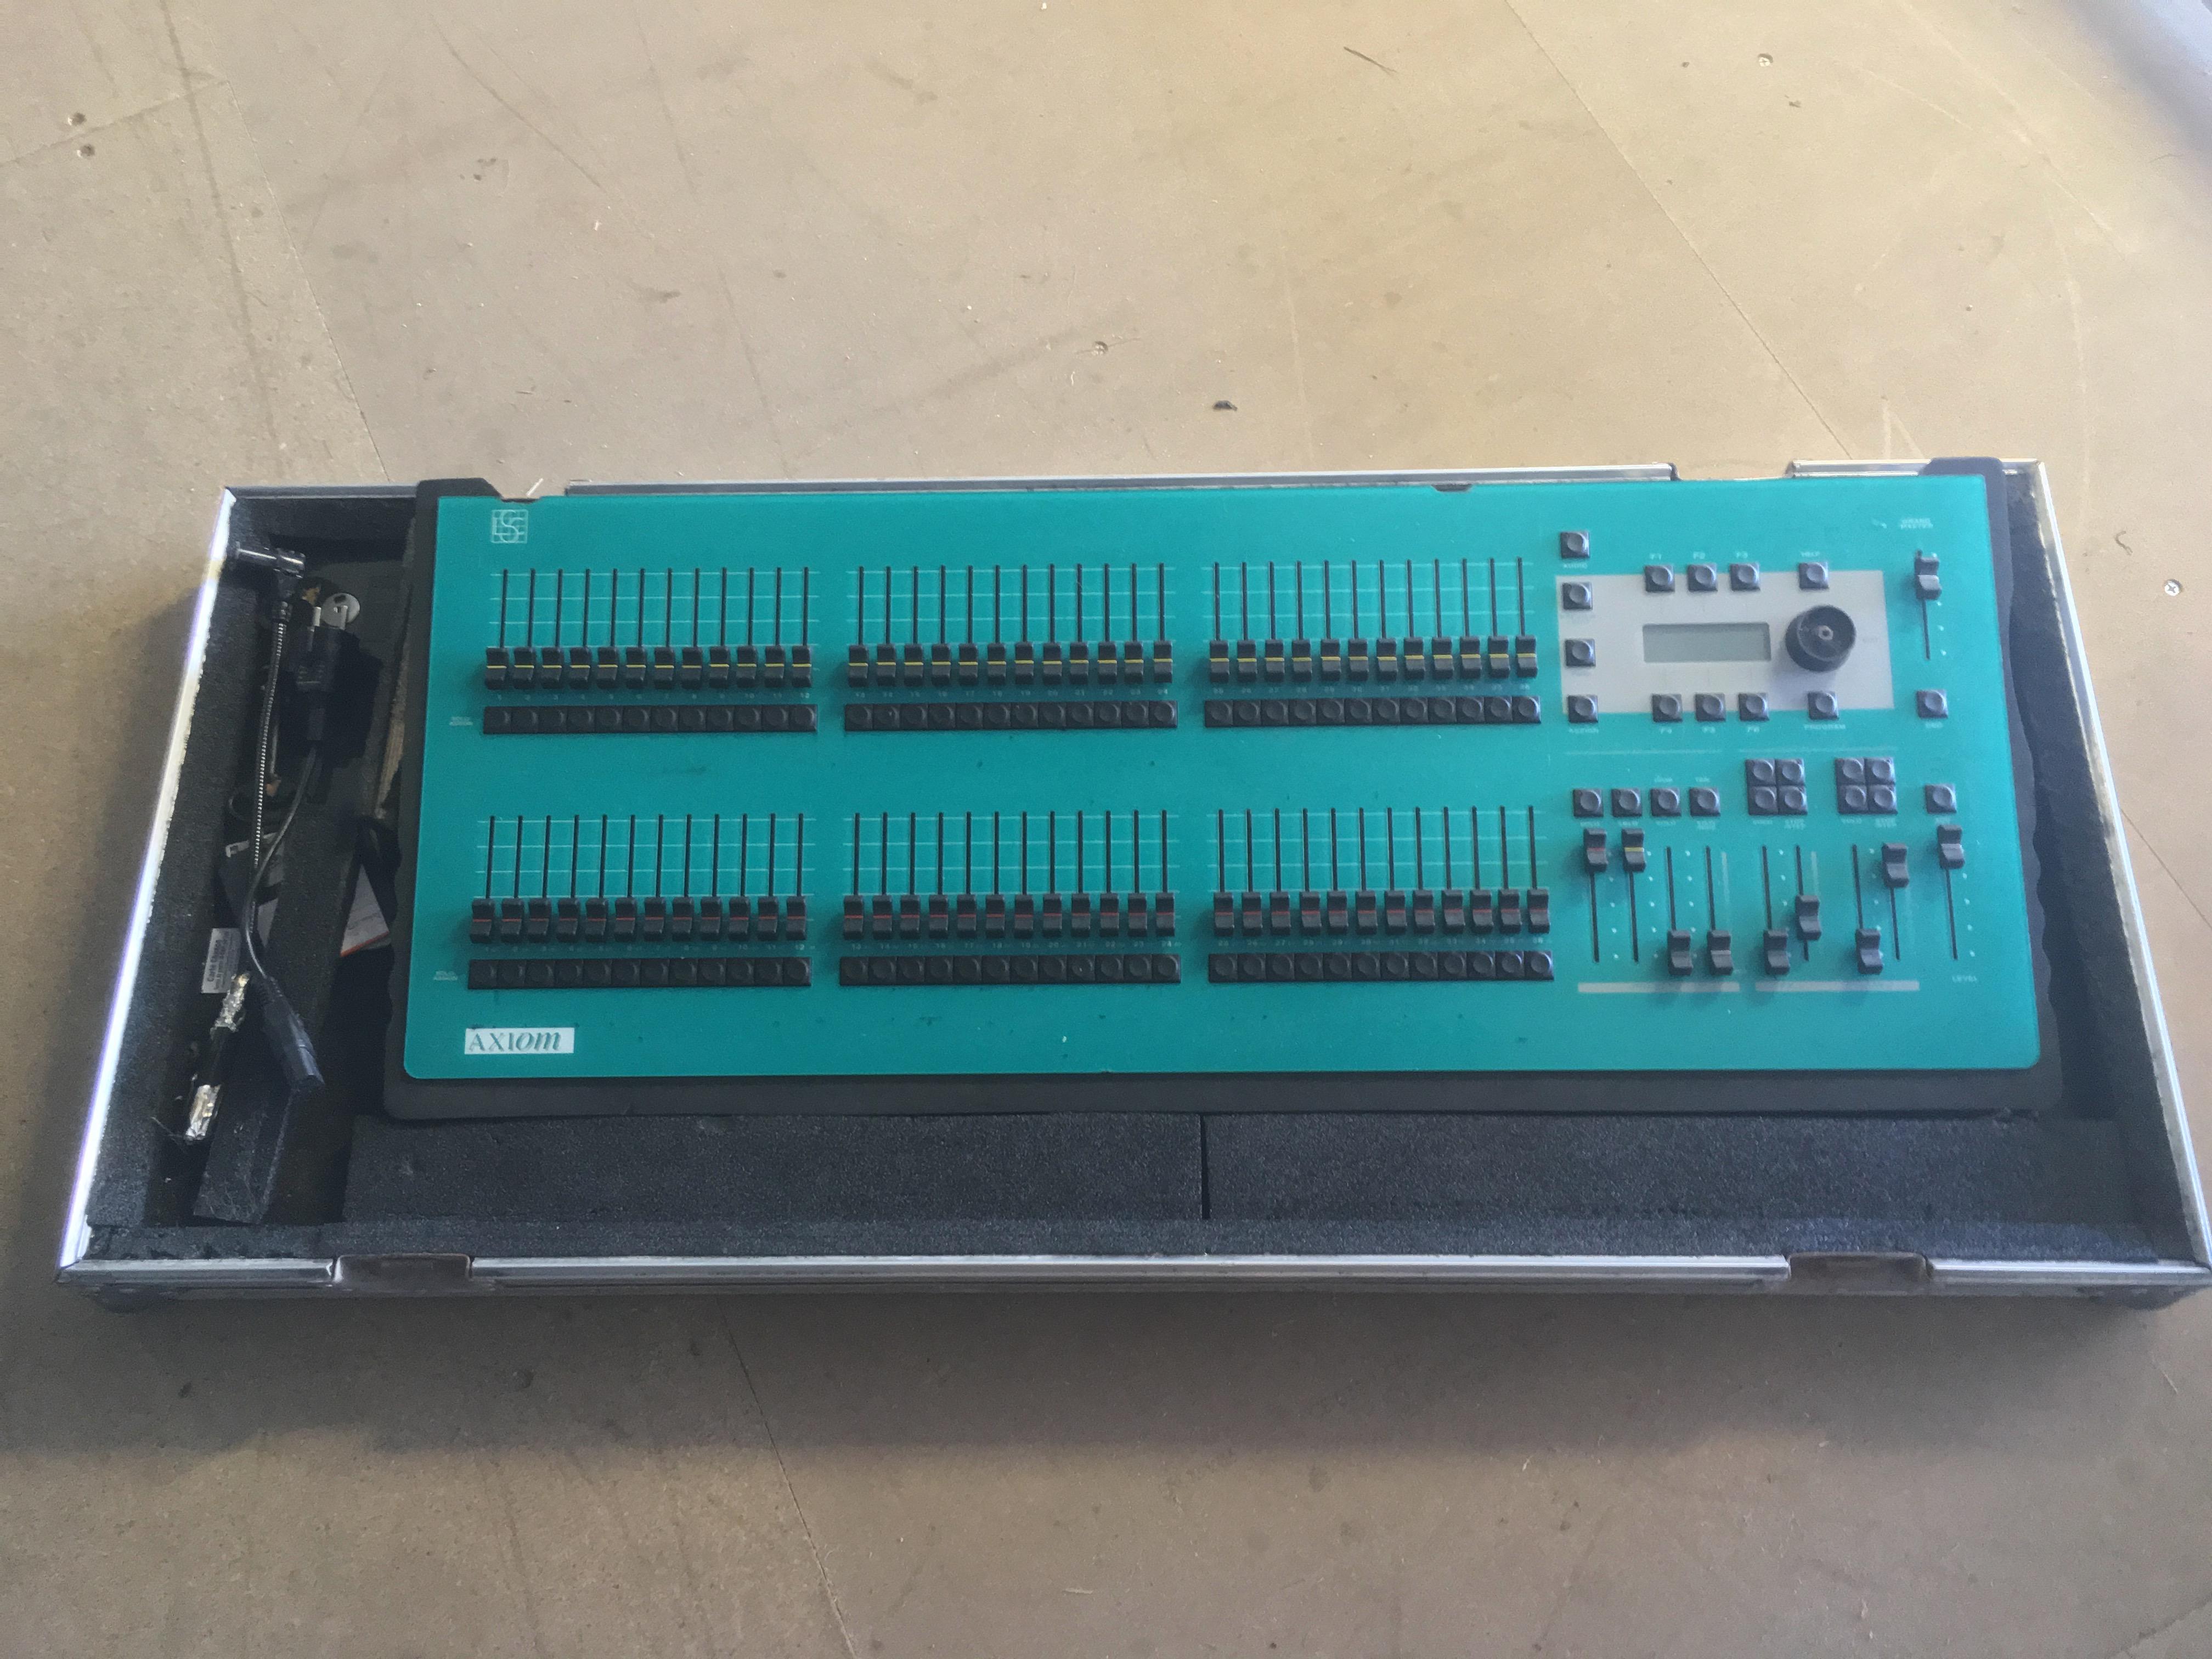 LSC Lighting Systems Axiom 36/72 image (#2027171) - Audiofanzine